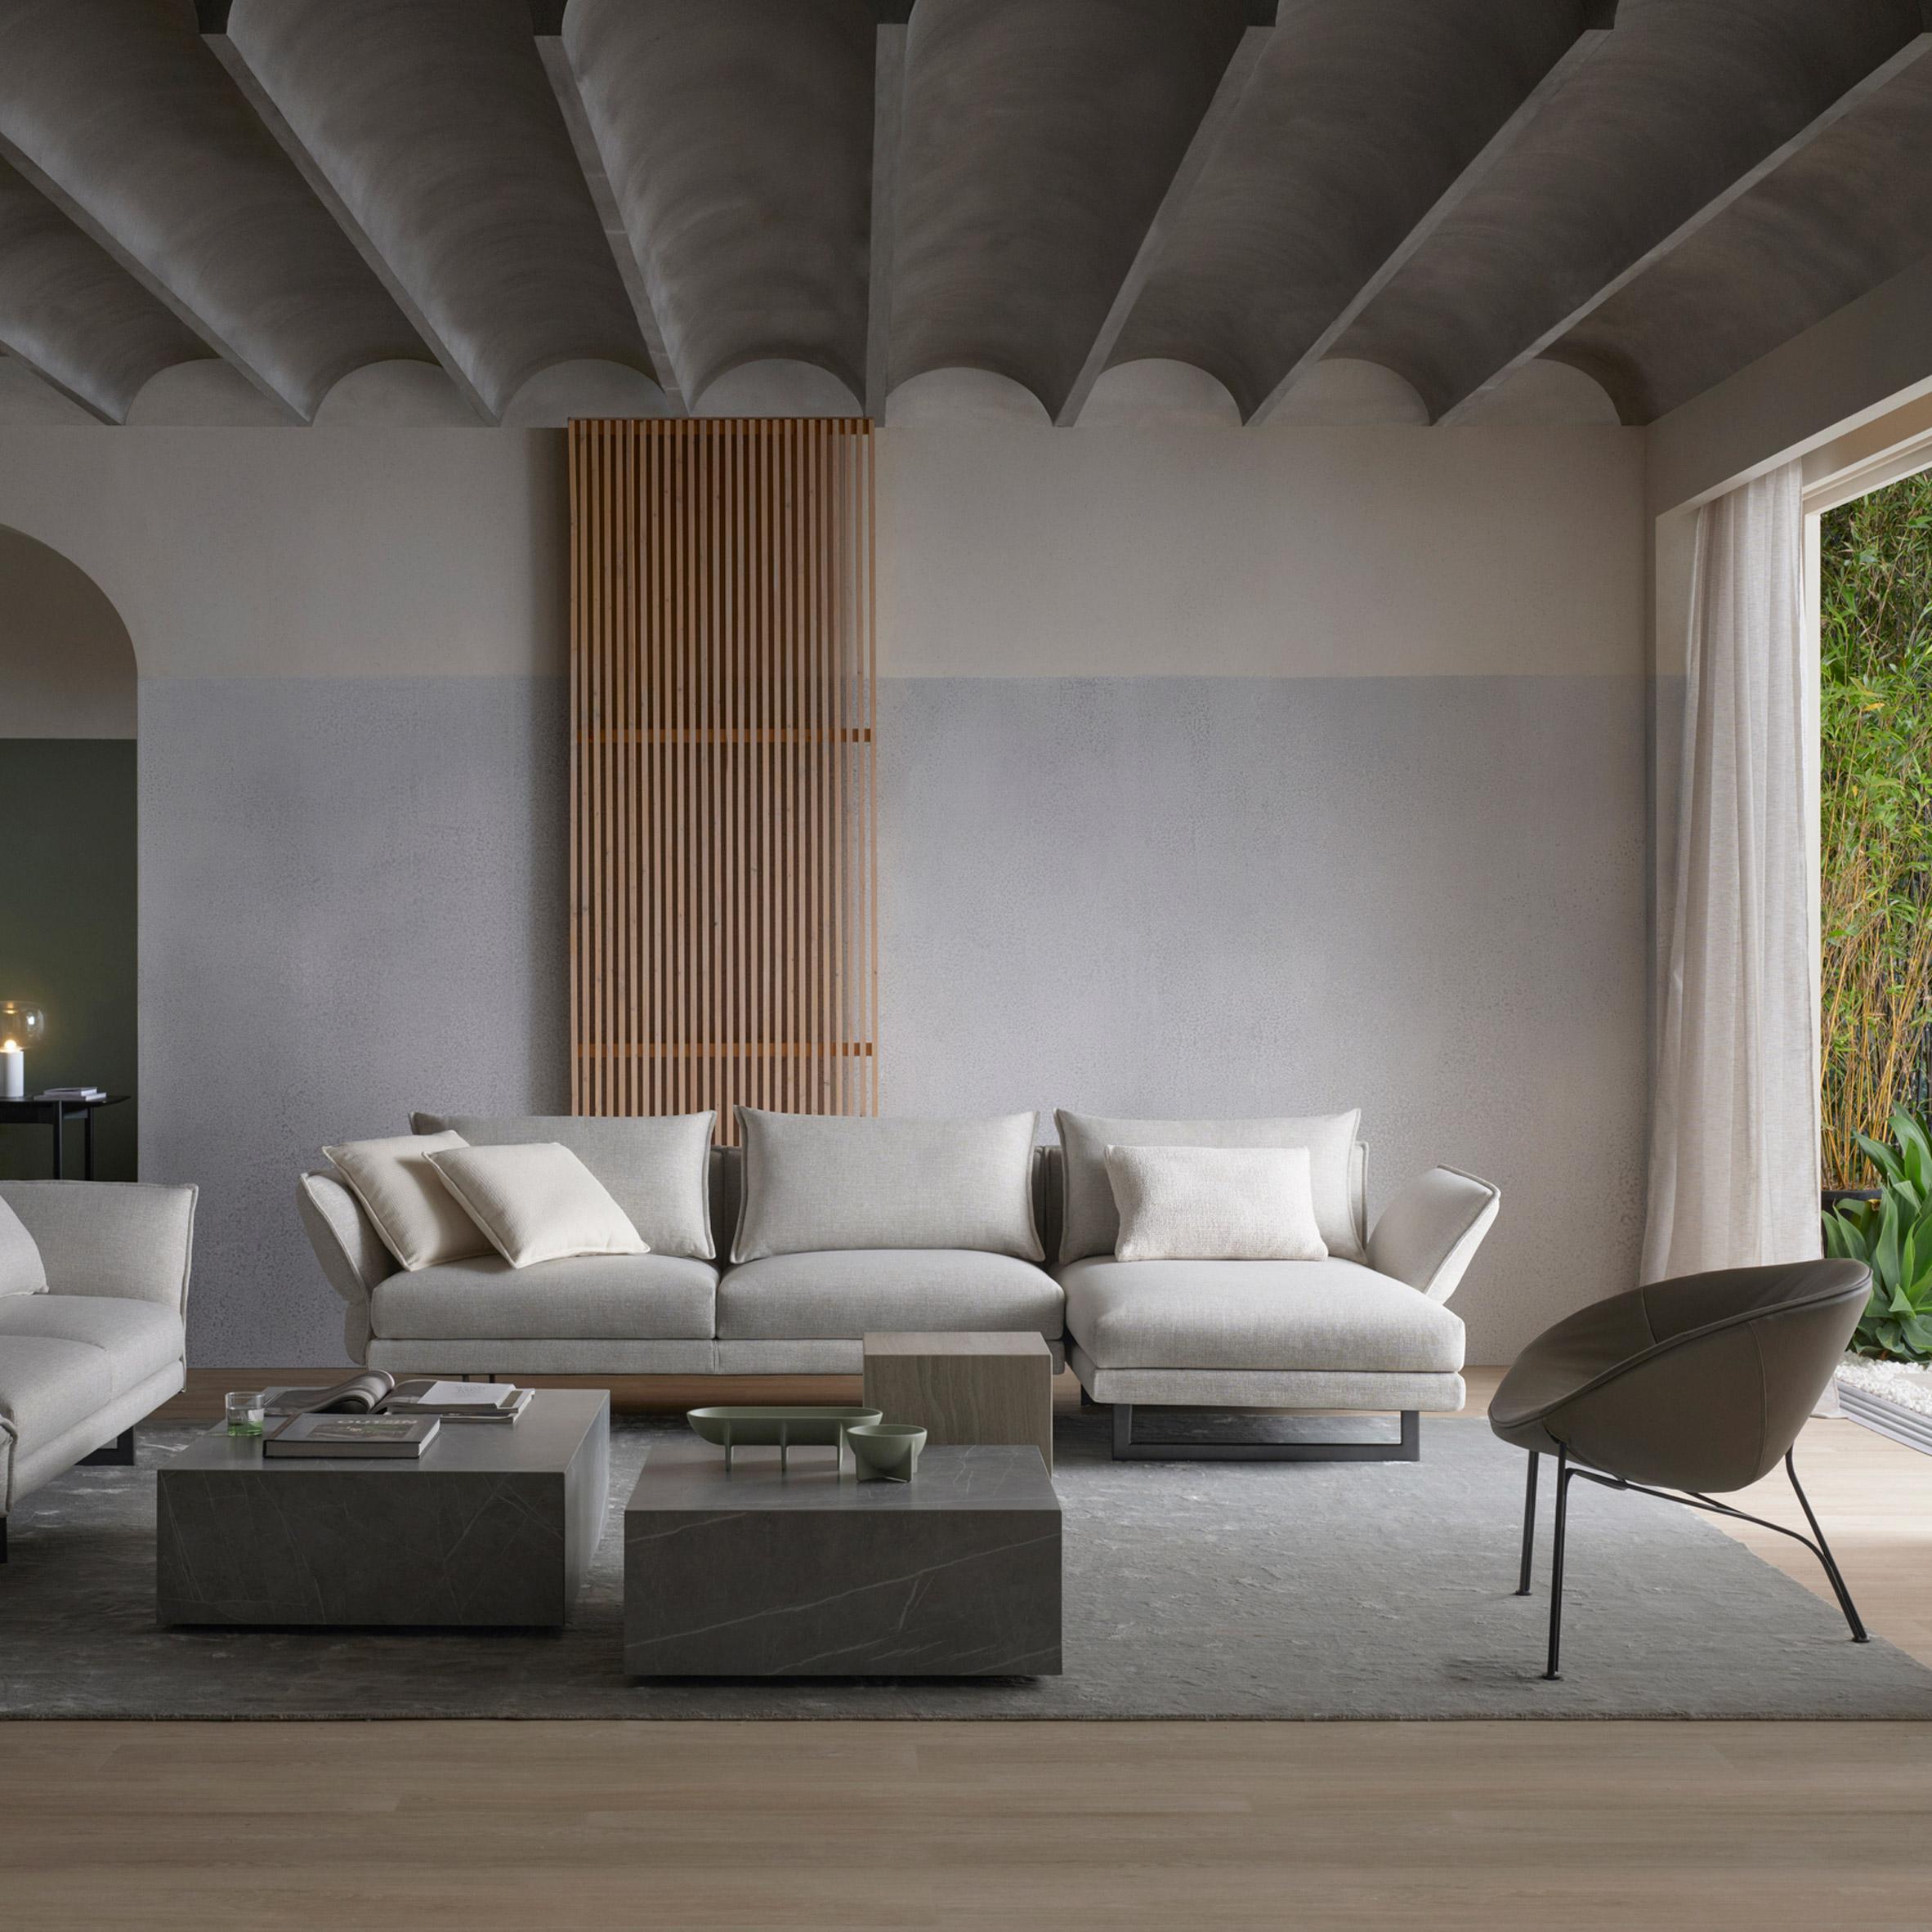 Zaza sofa by Charles Wilson for King